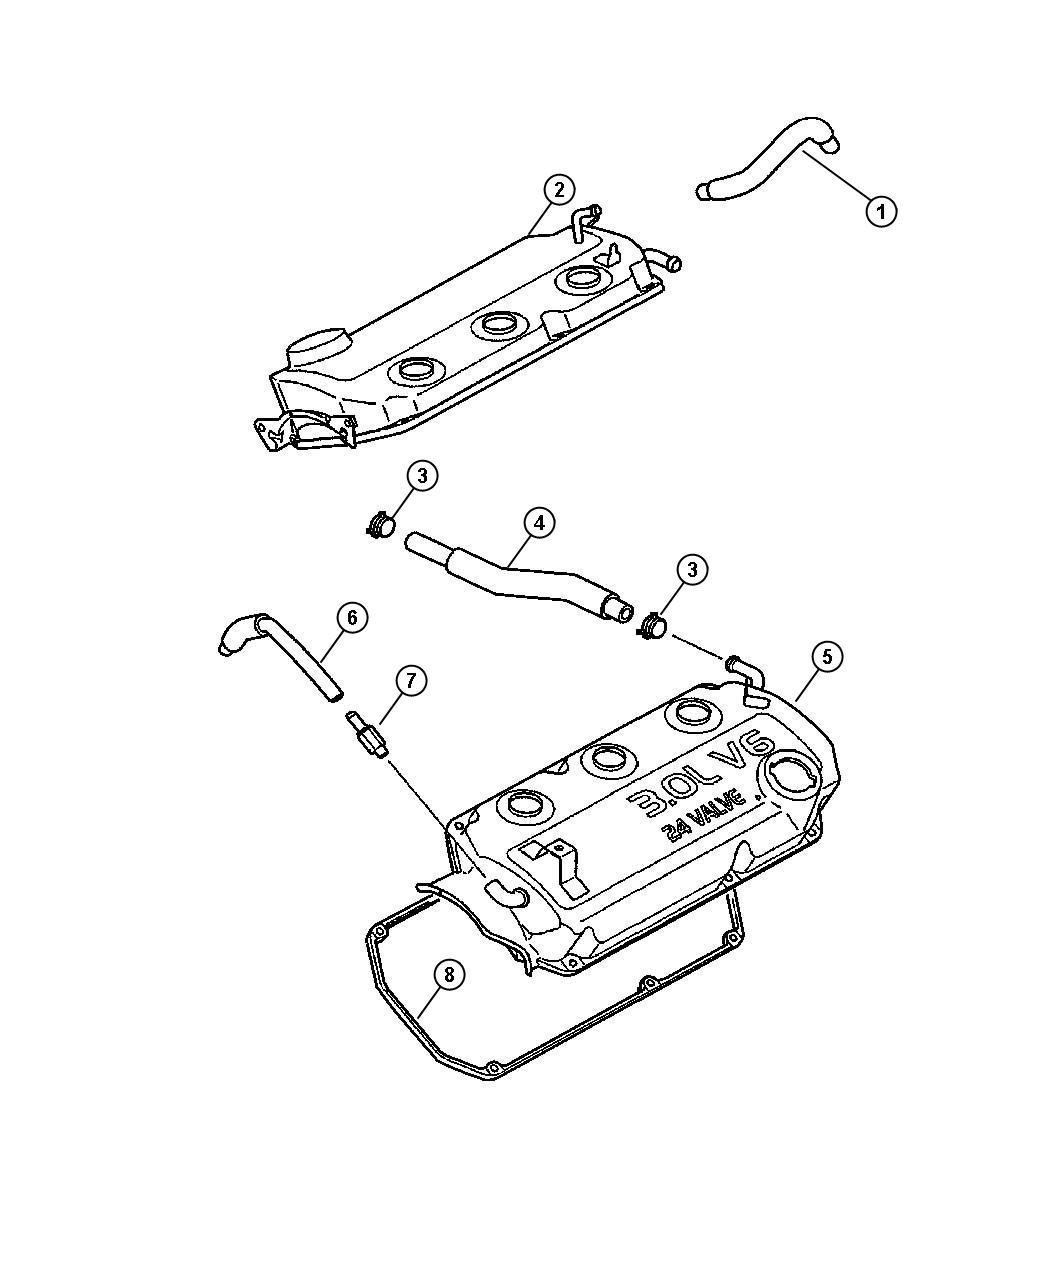 Dodge Stratus Valve. Pcv. Ventilation, crankcase, mmc